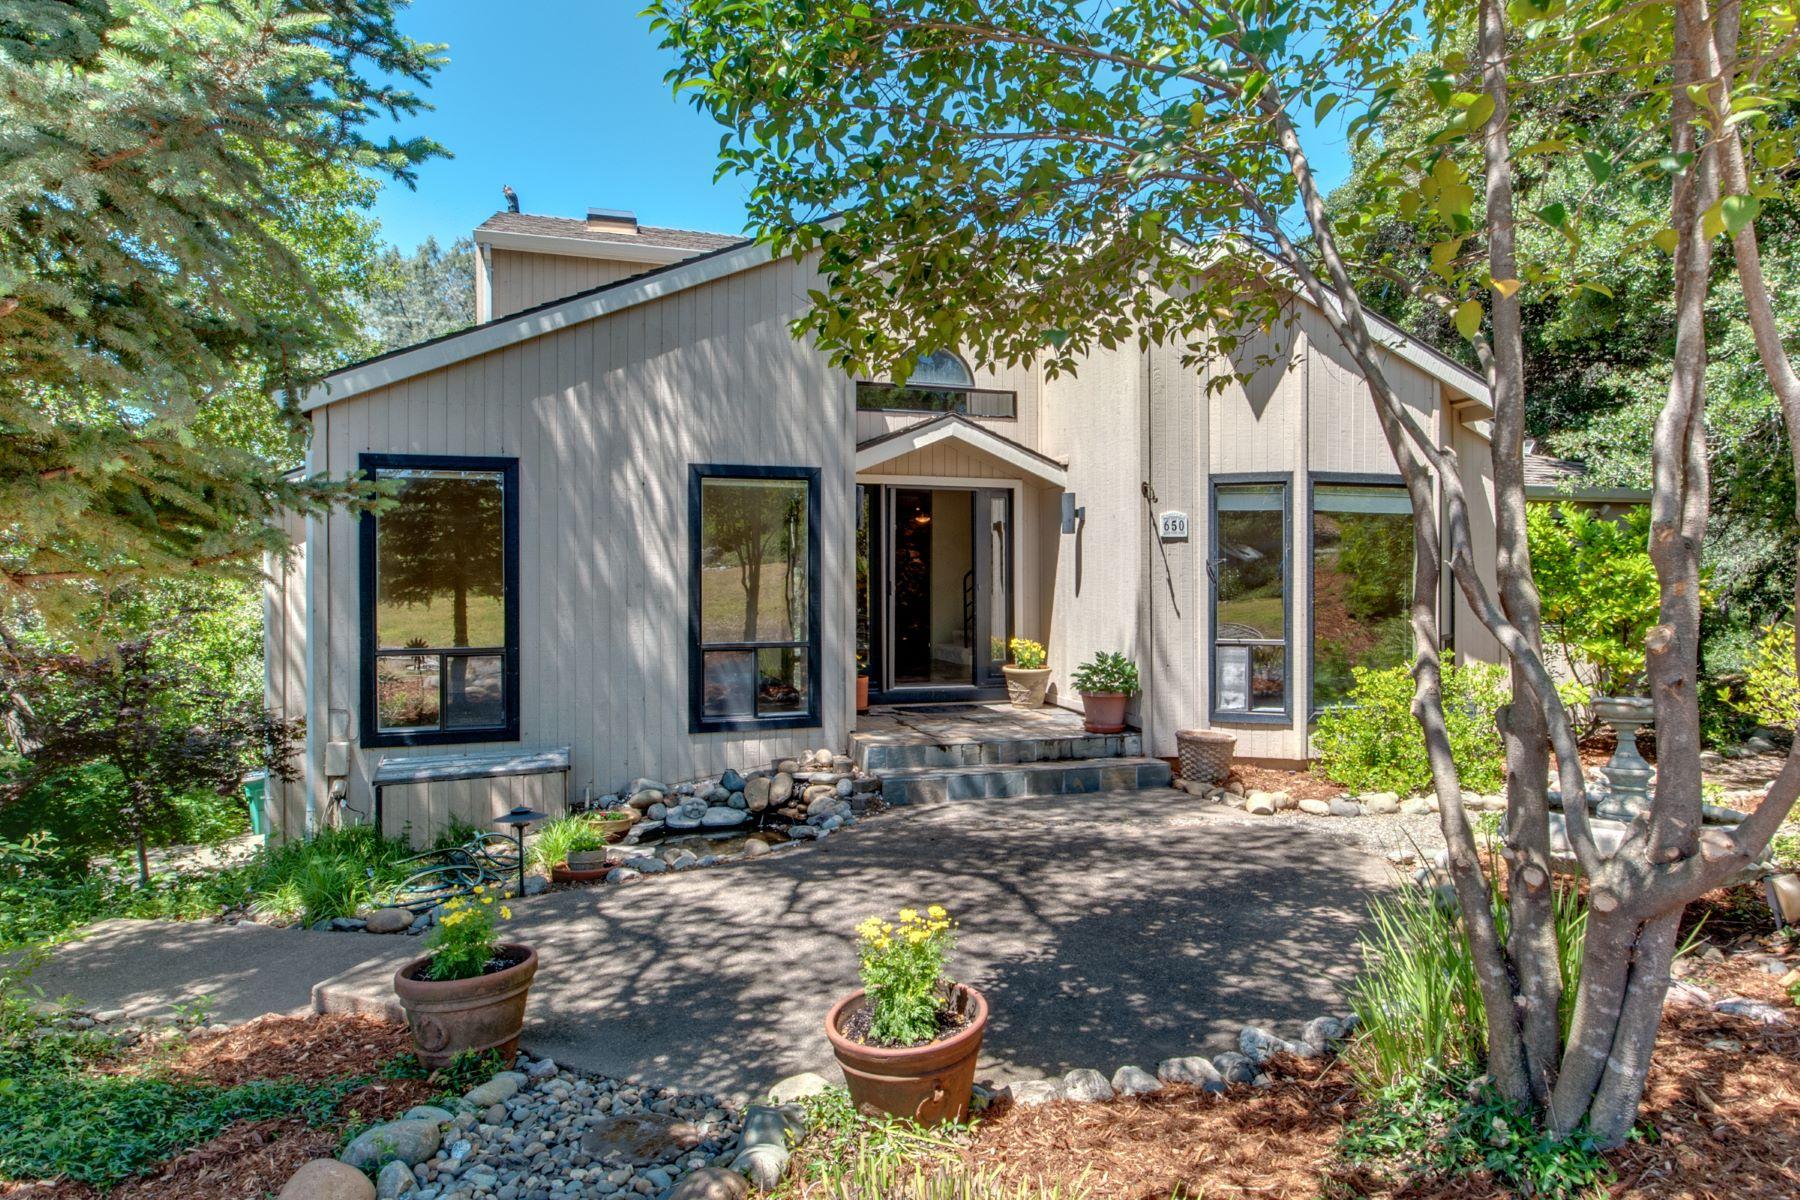 Single Family Home for Sale at 650 Canyon Oak Court El Dorado Hills, California 95762 United States